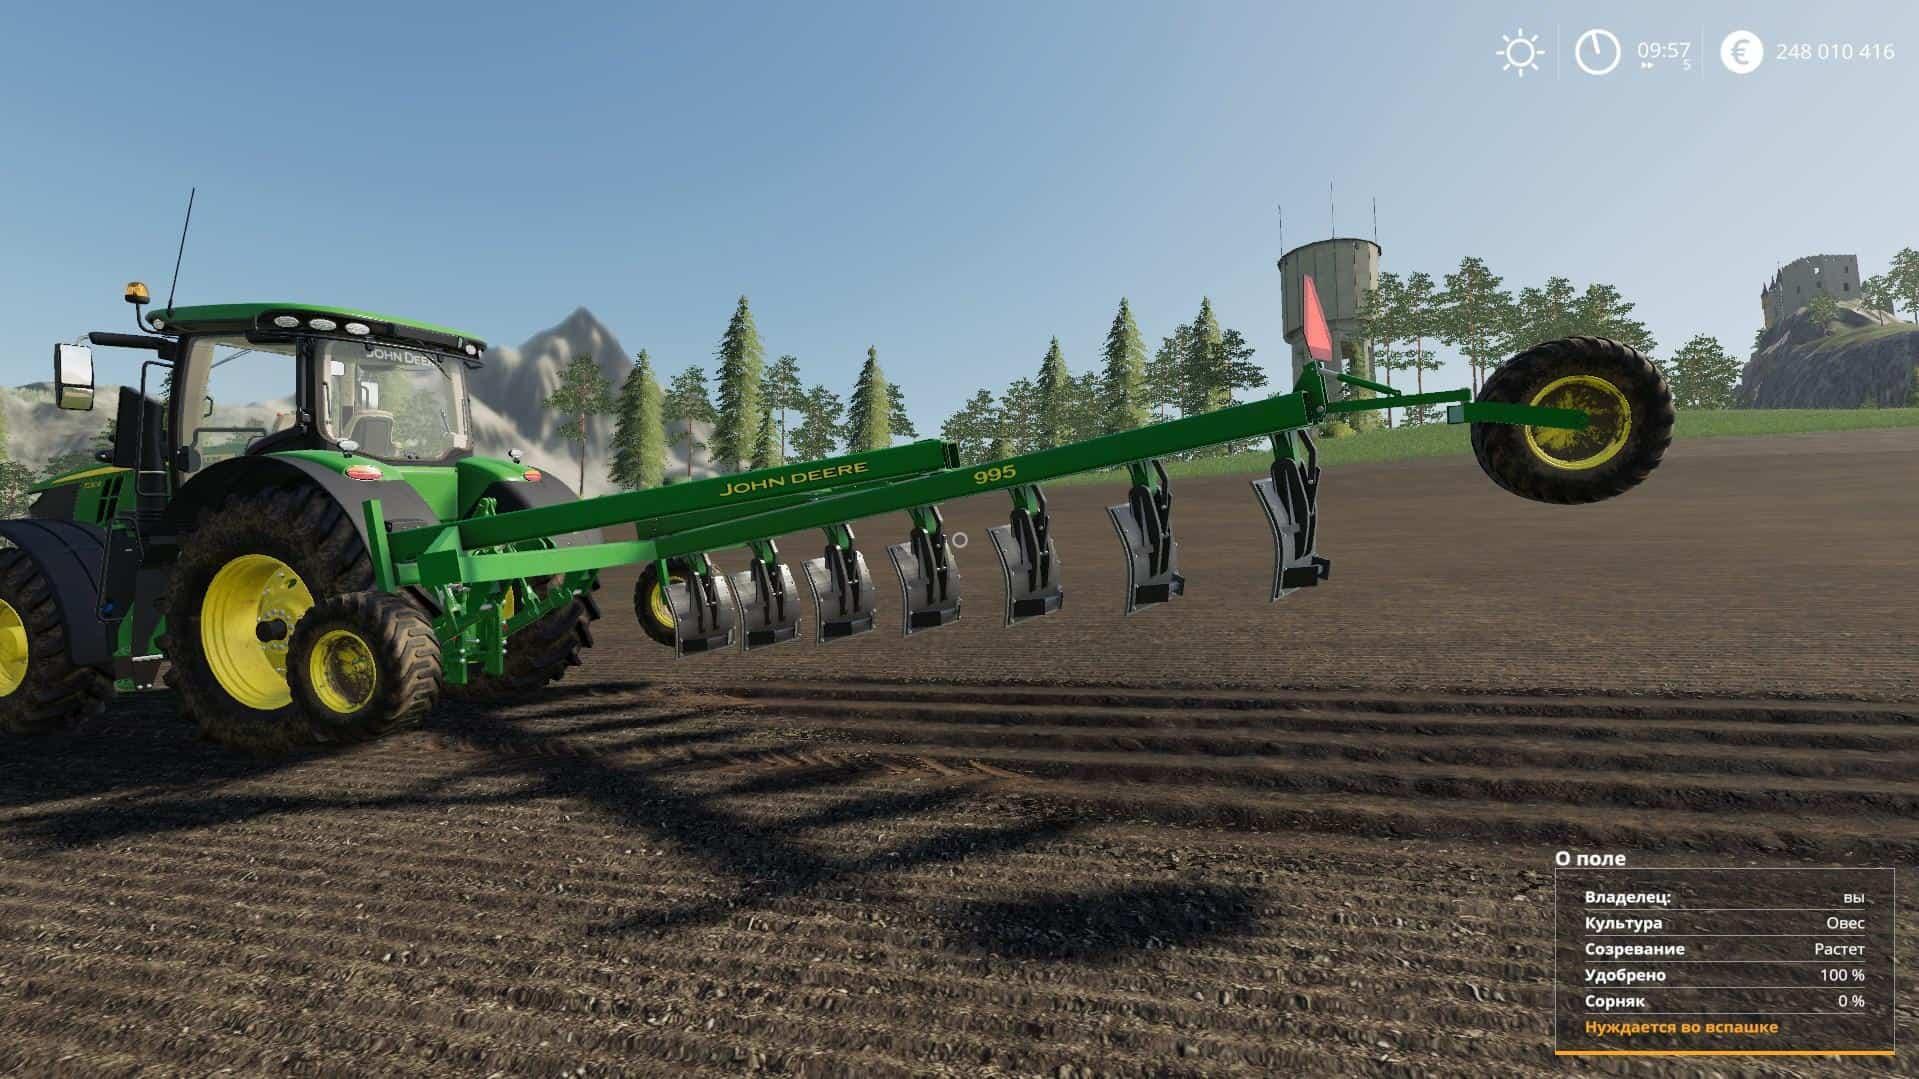 John Deere 995 v1 0 0 0 Mod - Farming Simulator 19 Mod / FS19